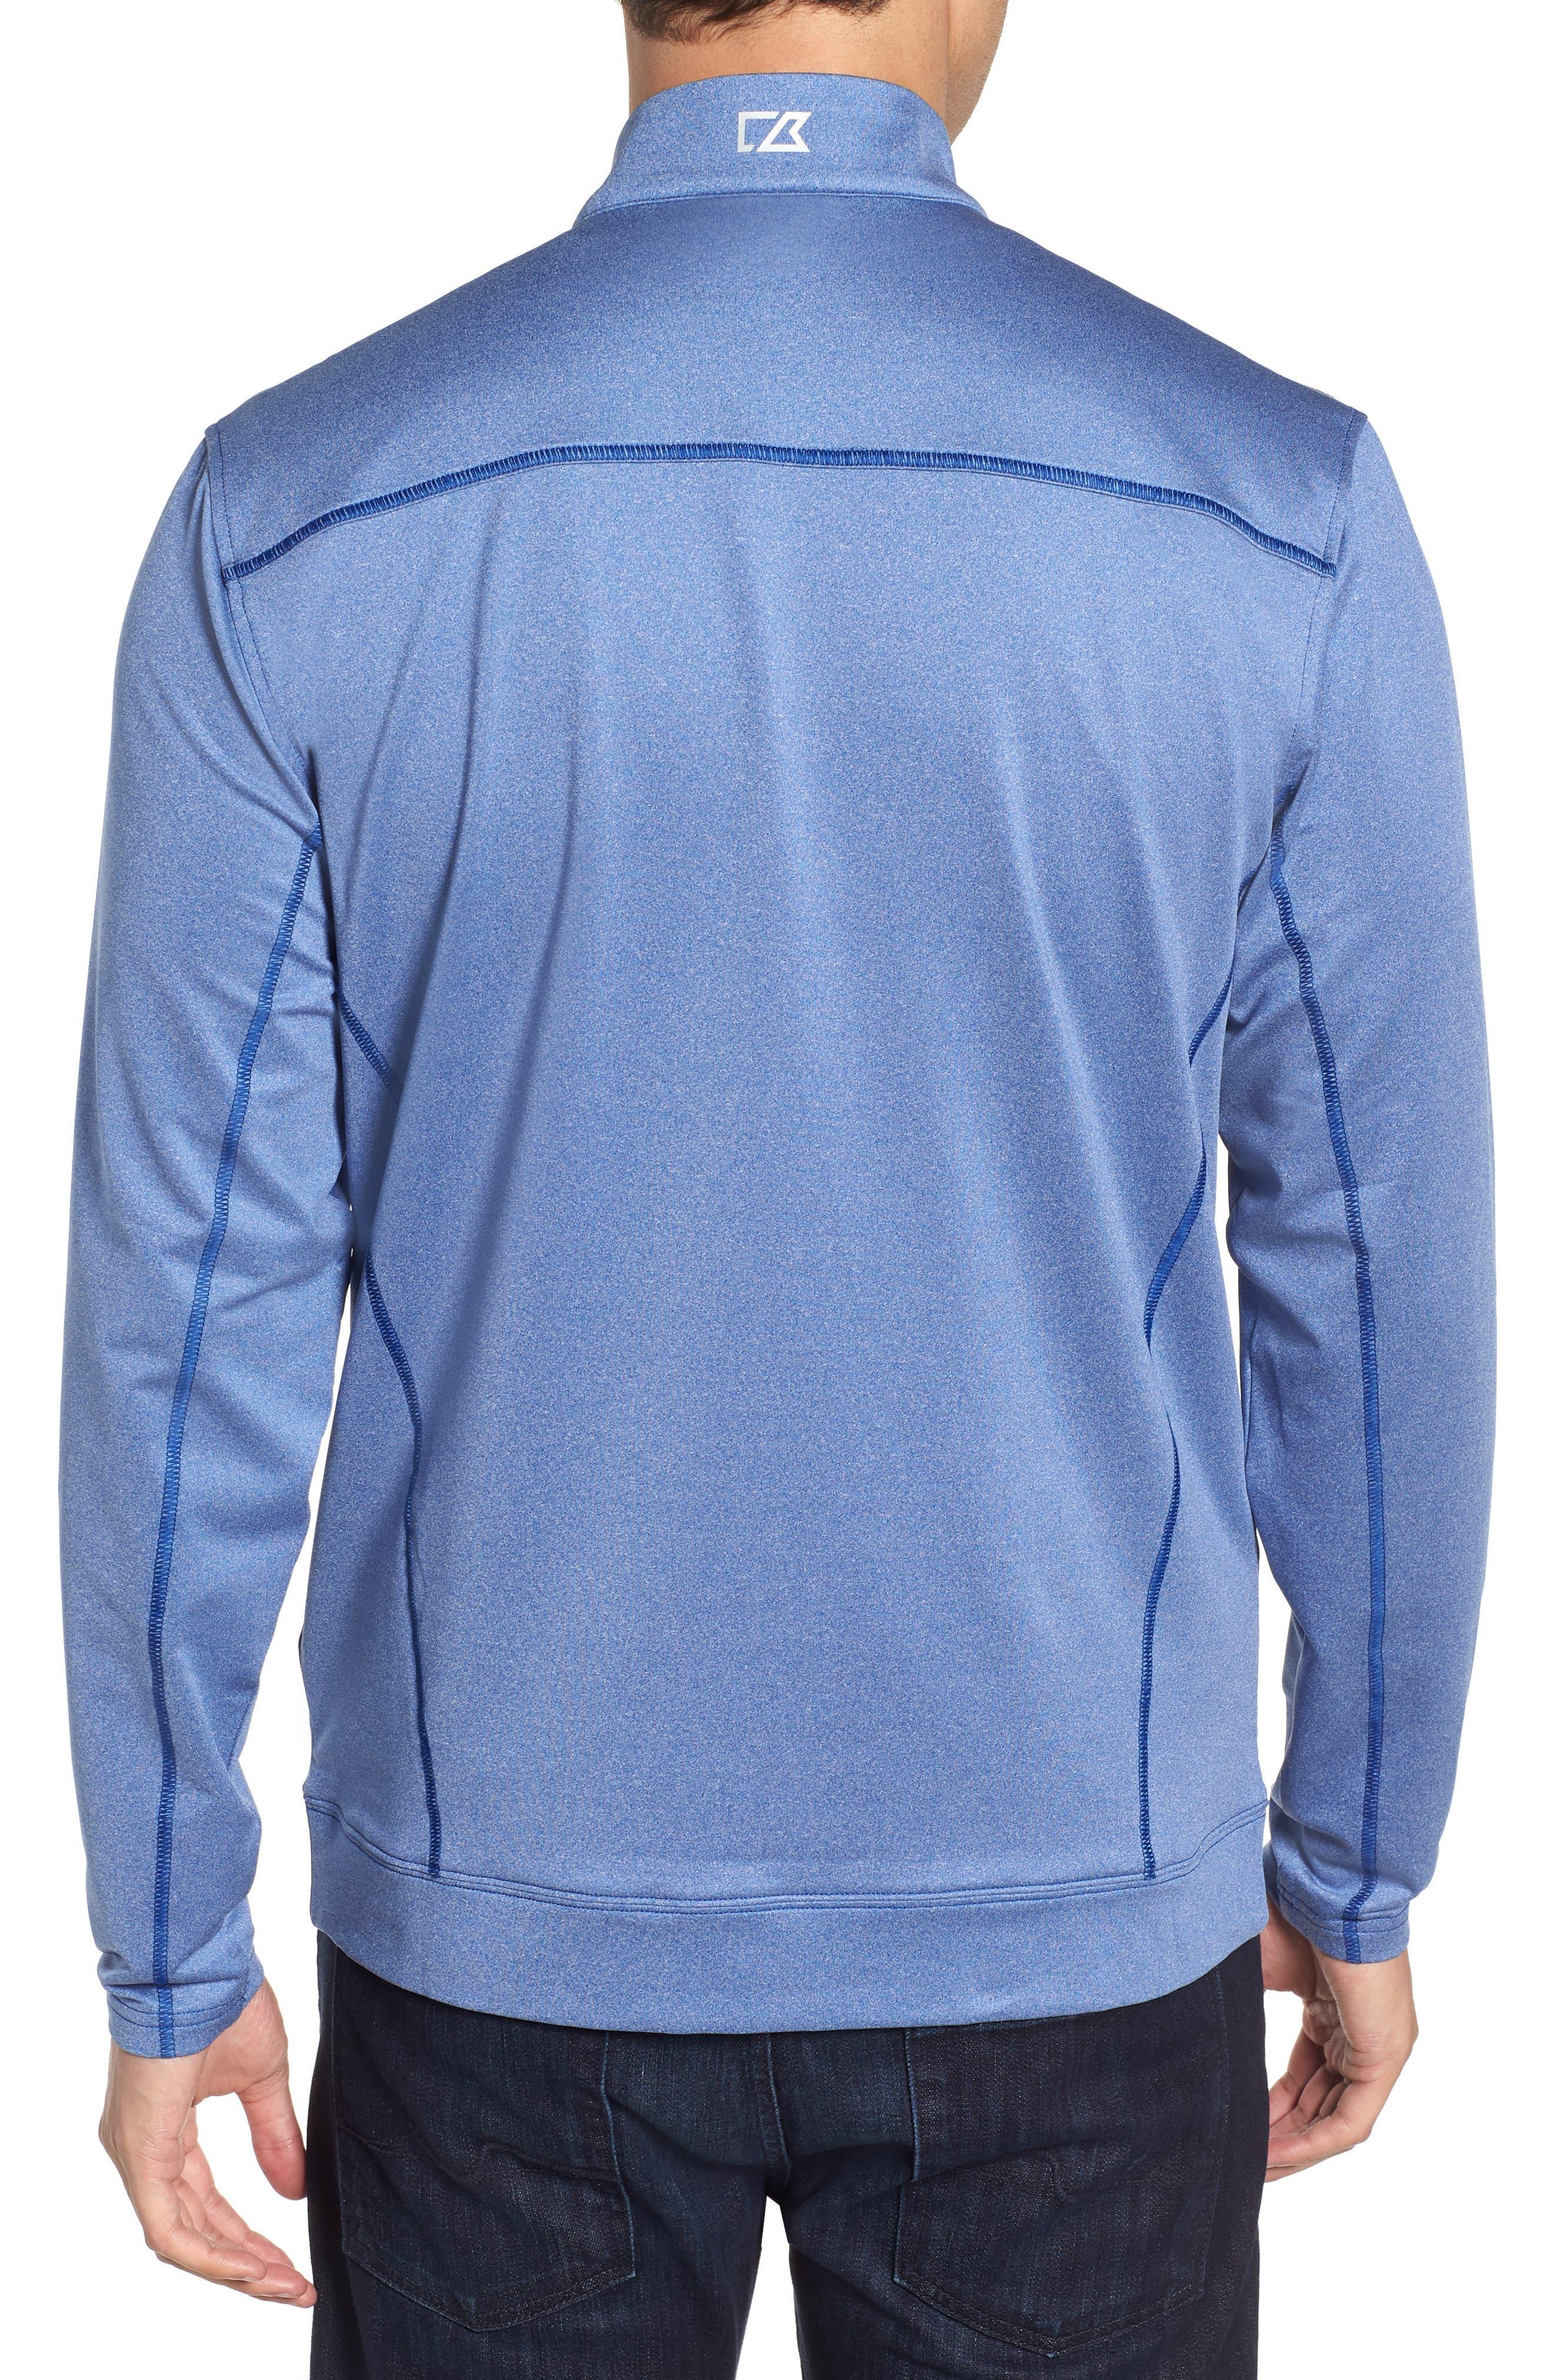 Endurance New York Giants Regular Fit Pullover,                             Alternate thumbnail 2, color,                             TOUR BLUE HEATHER